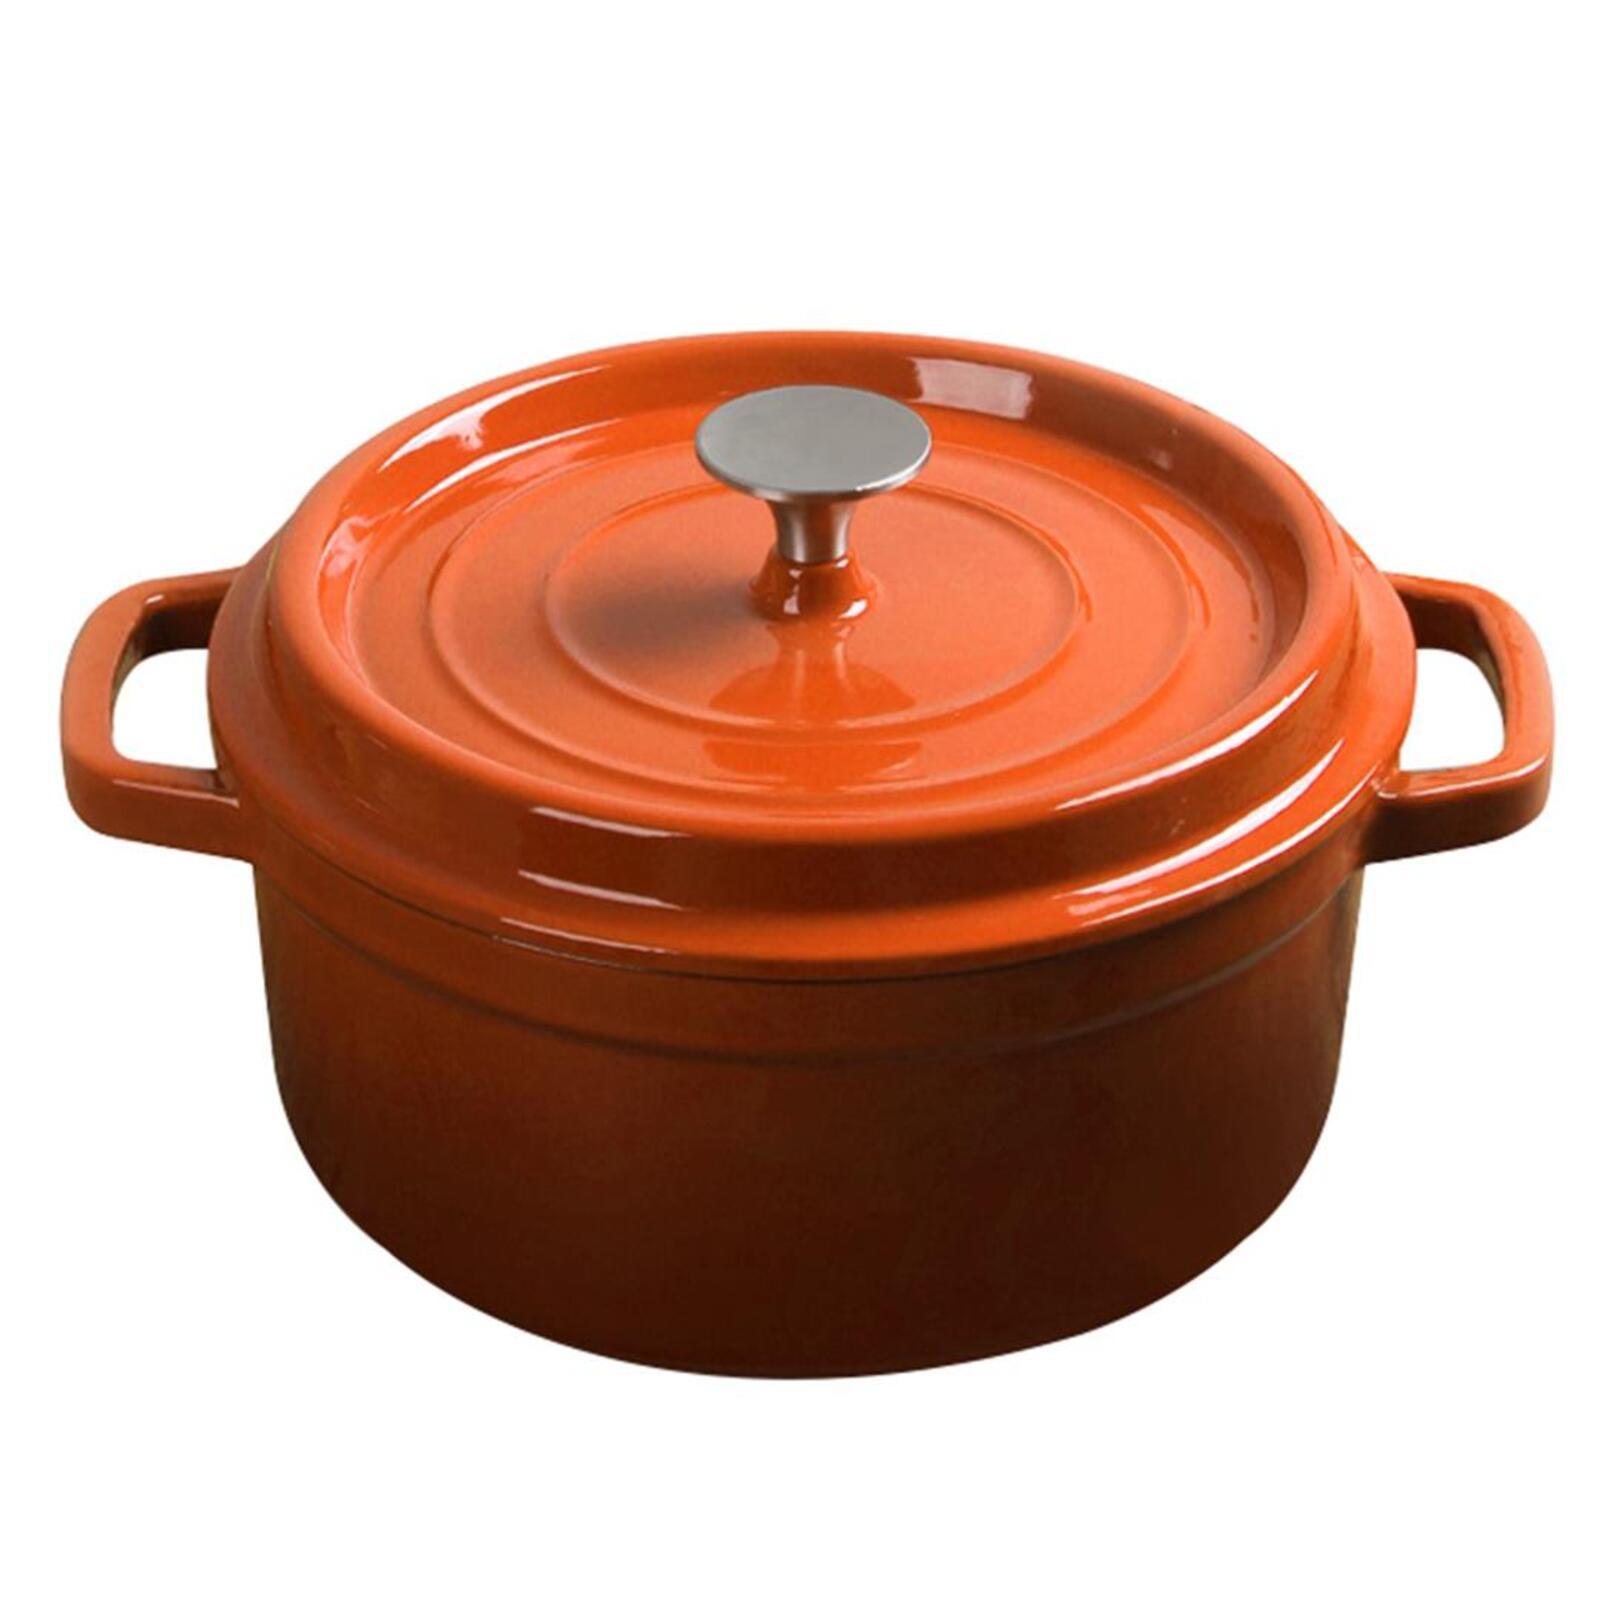 SOGA Cast Iron 3.6L Porcelain Casserole Stewpot Orange